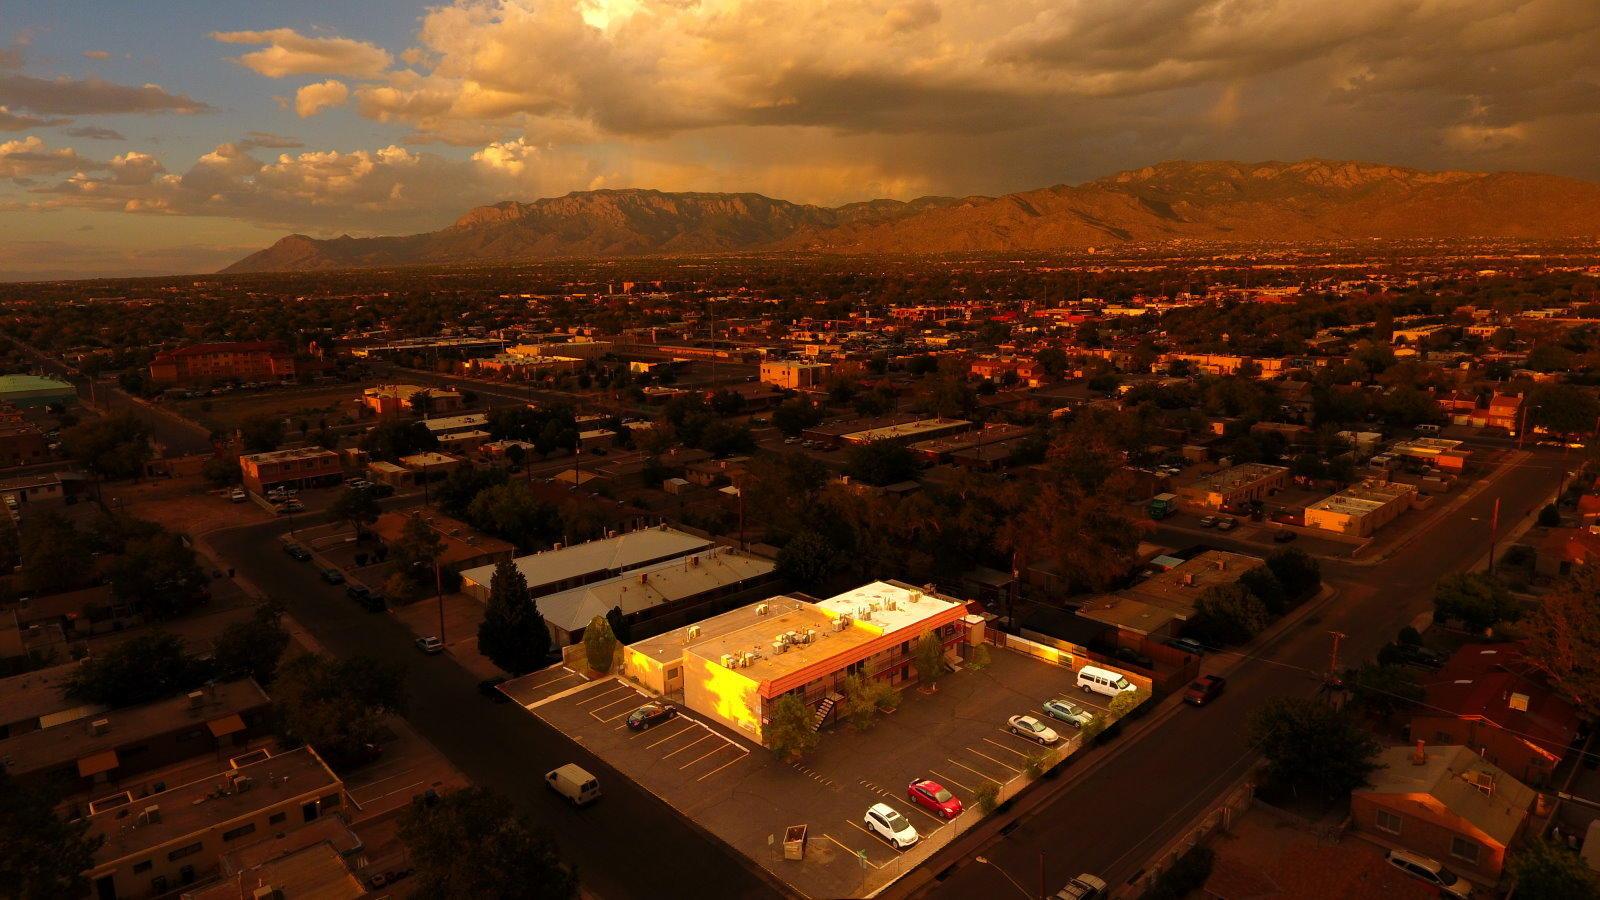 328 Tennessee Street SE, Albuquerque, NM 87108 - Albuquerque, NM real estate listing